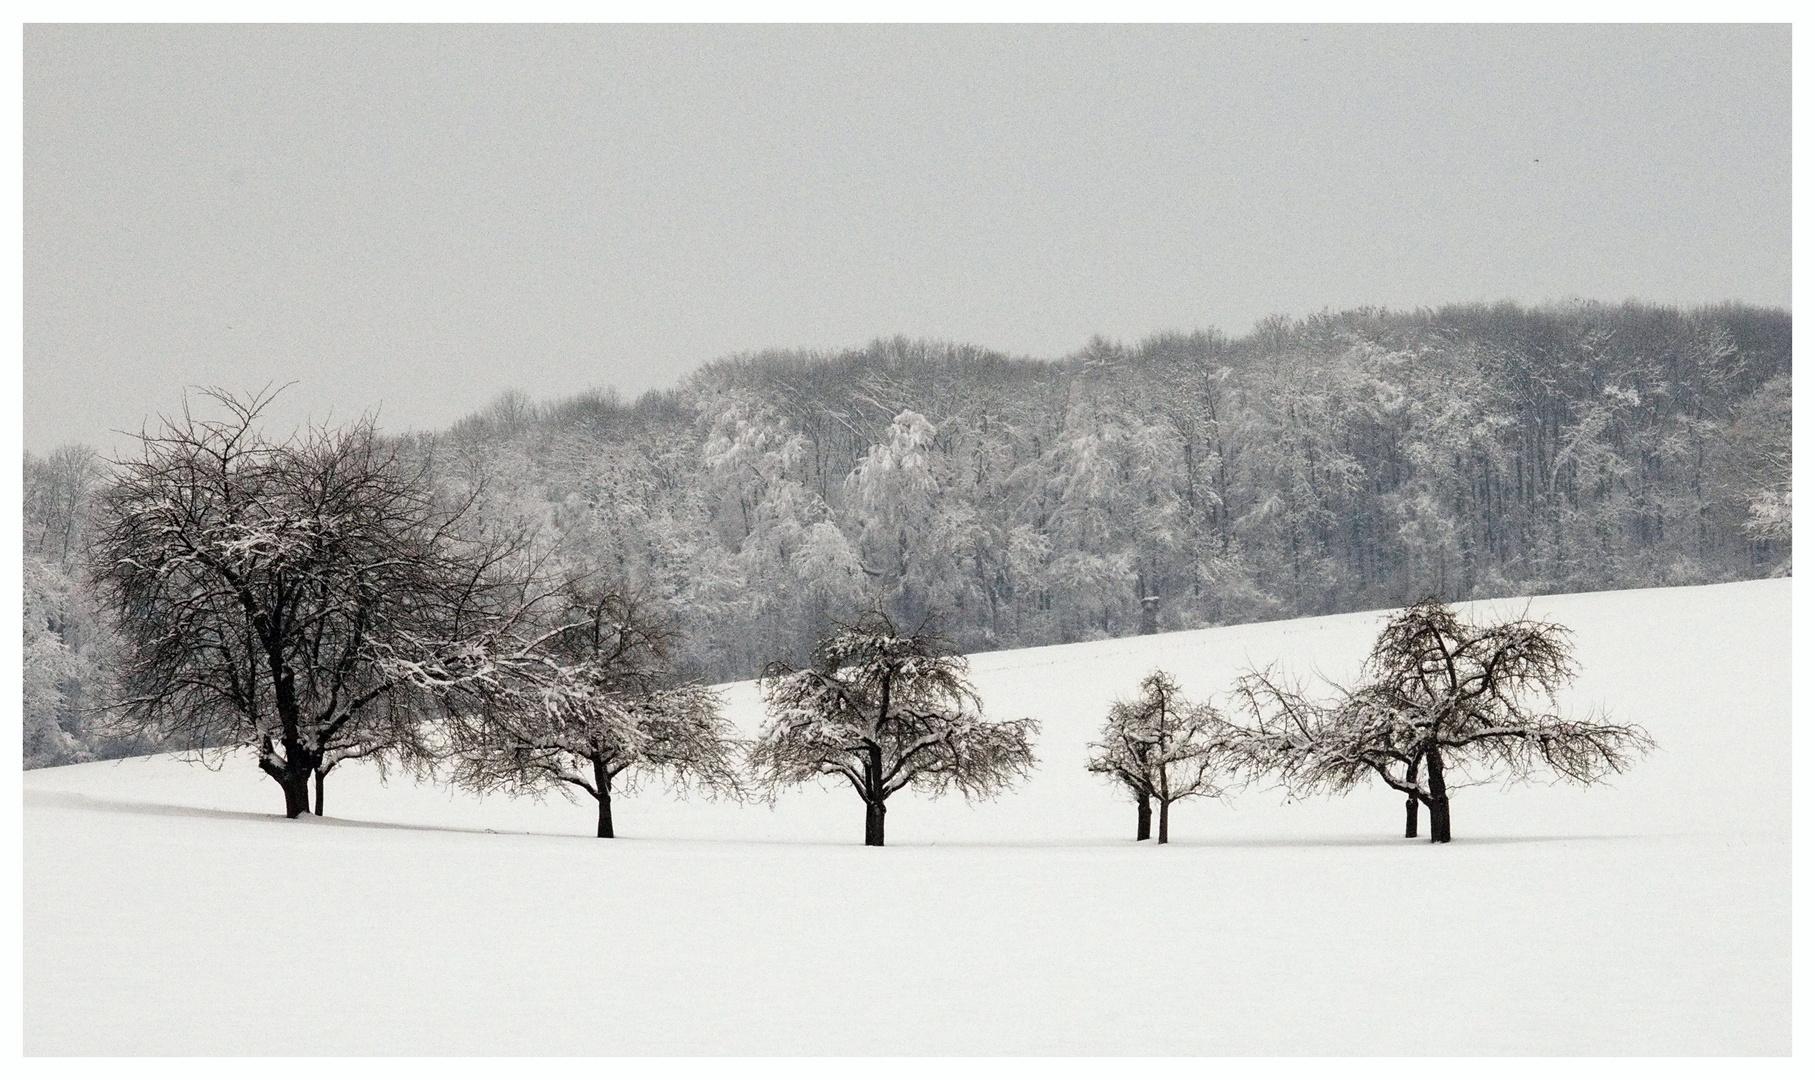 Winterimpressionen III